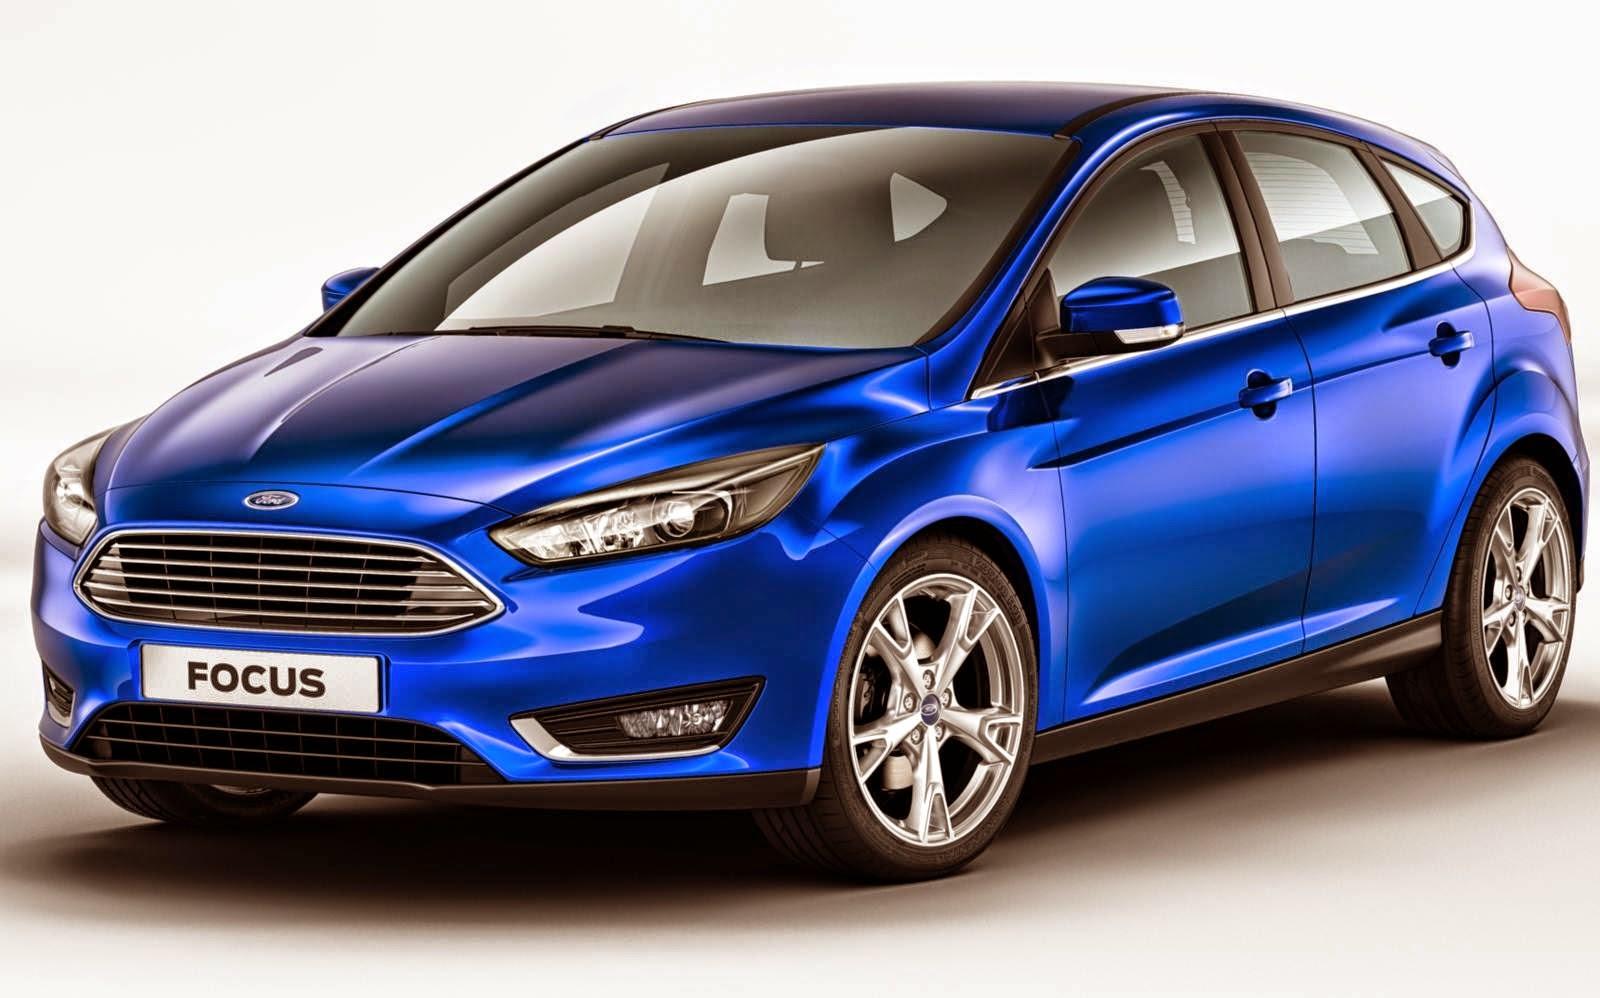 novos carros 2015 brasil Ford Focus 2015